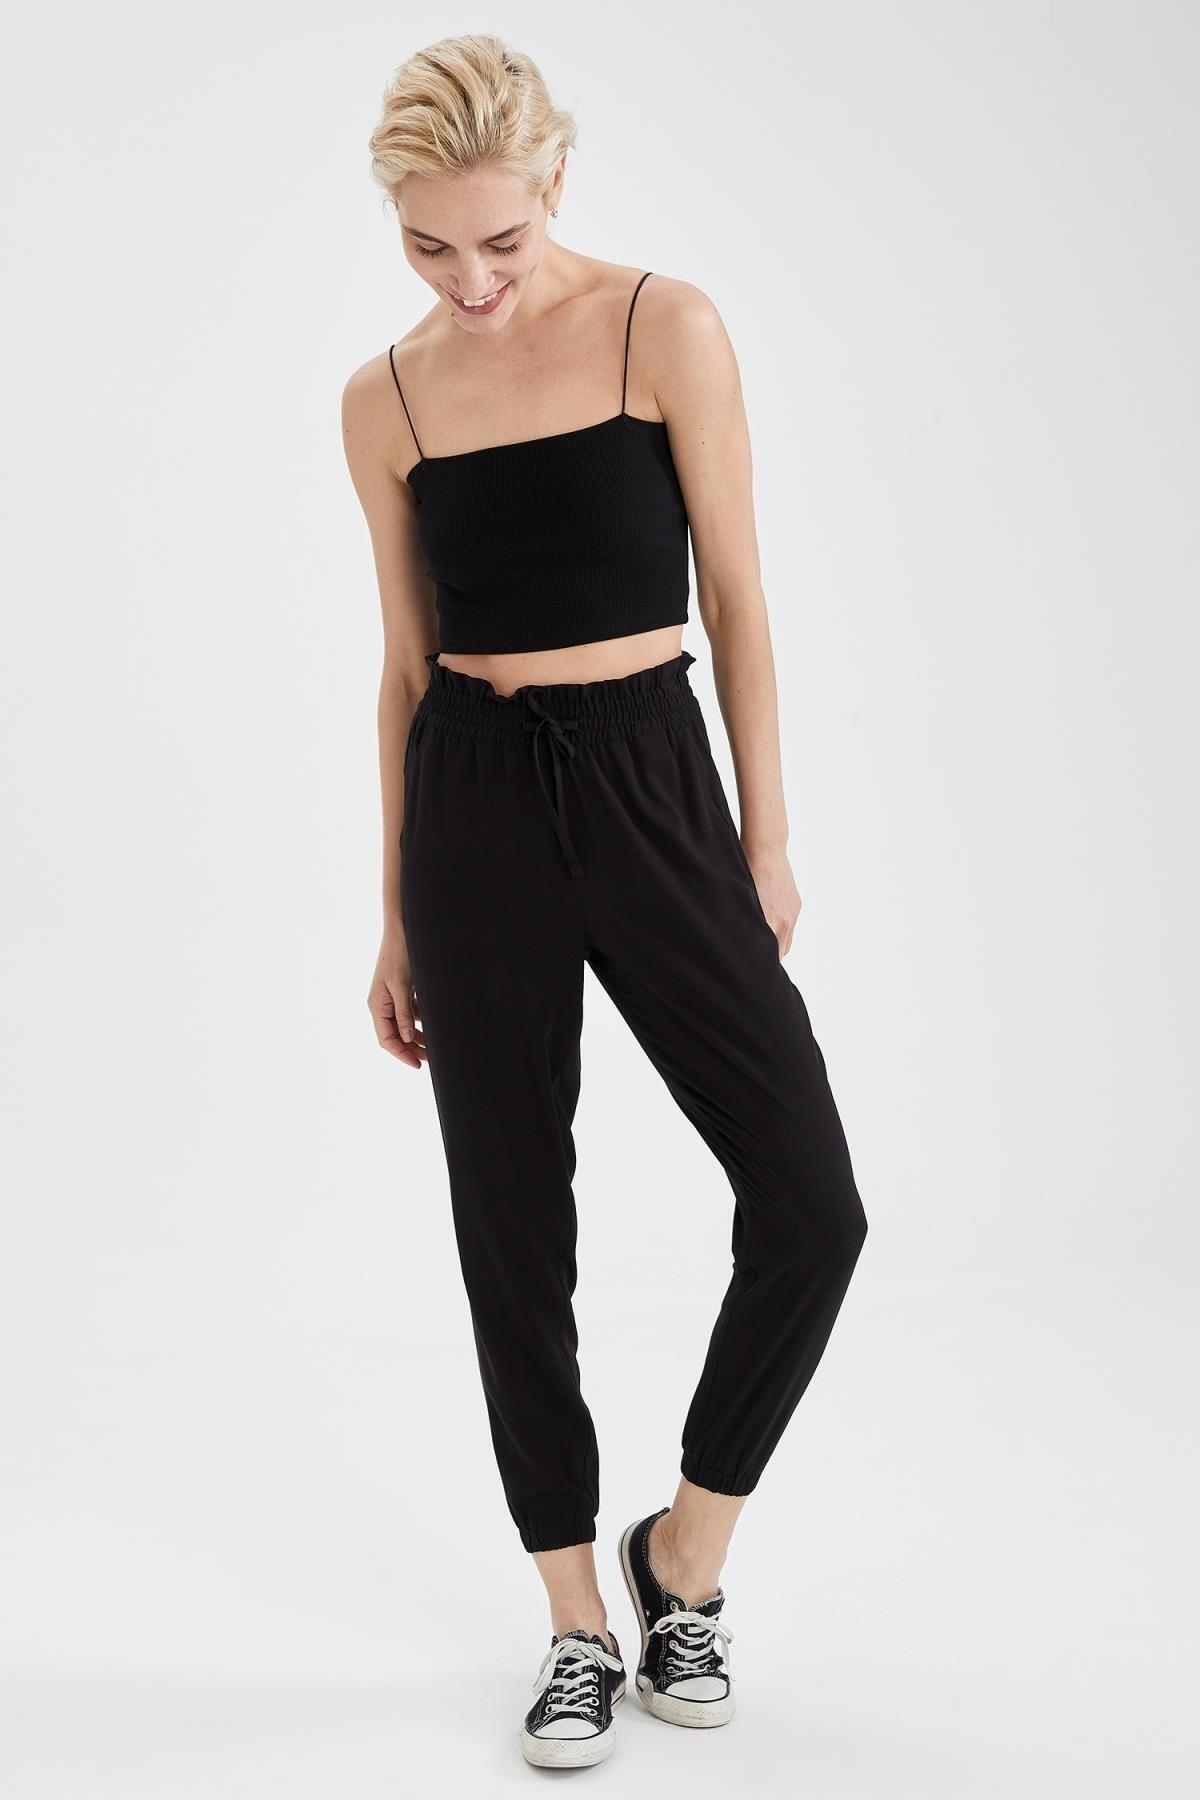 Kadın Siyah Beli Bağcıklı Relax Fit Jogger Pantolon